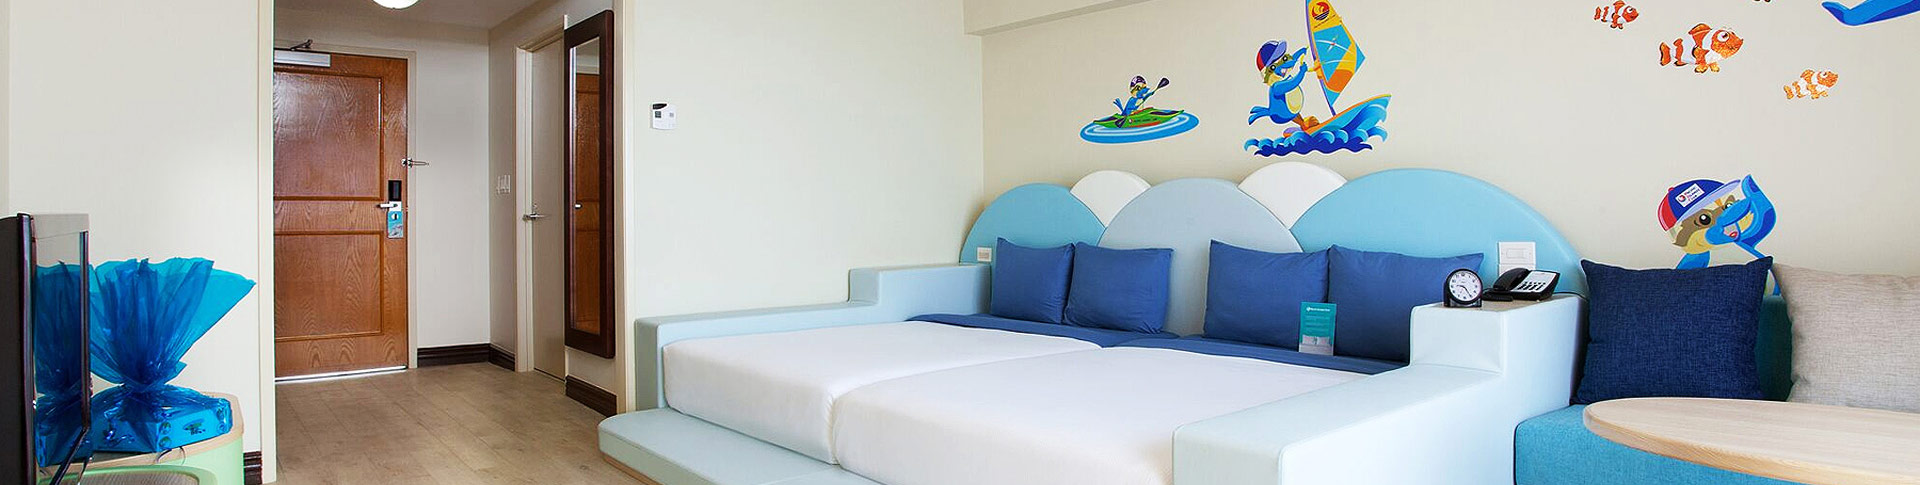 Rooms at Pacific Islands Club Guam